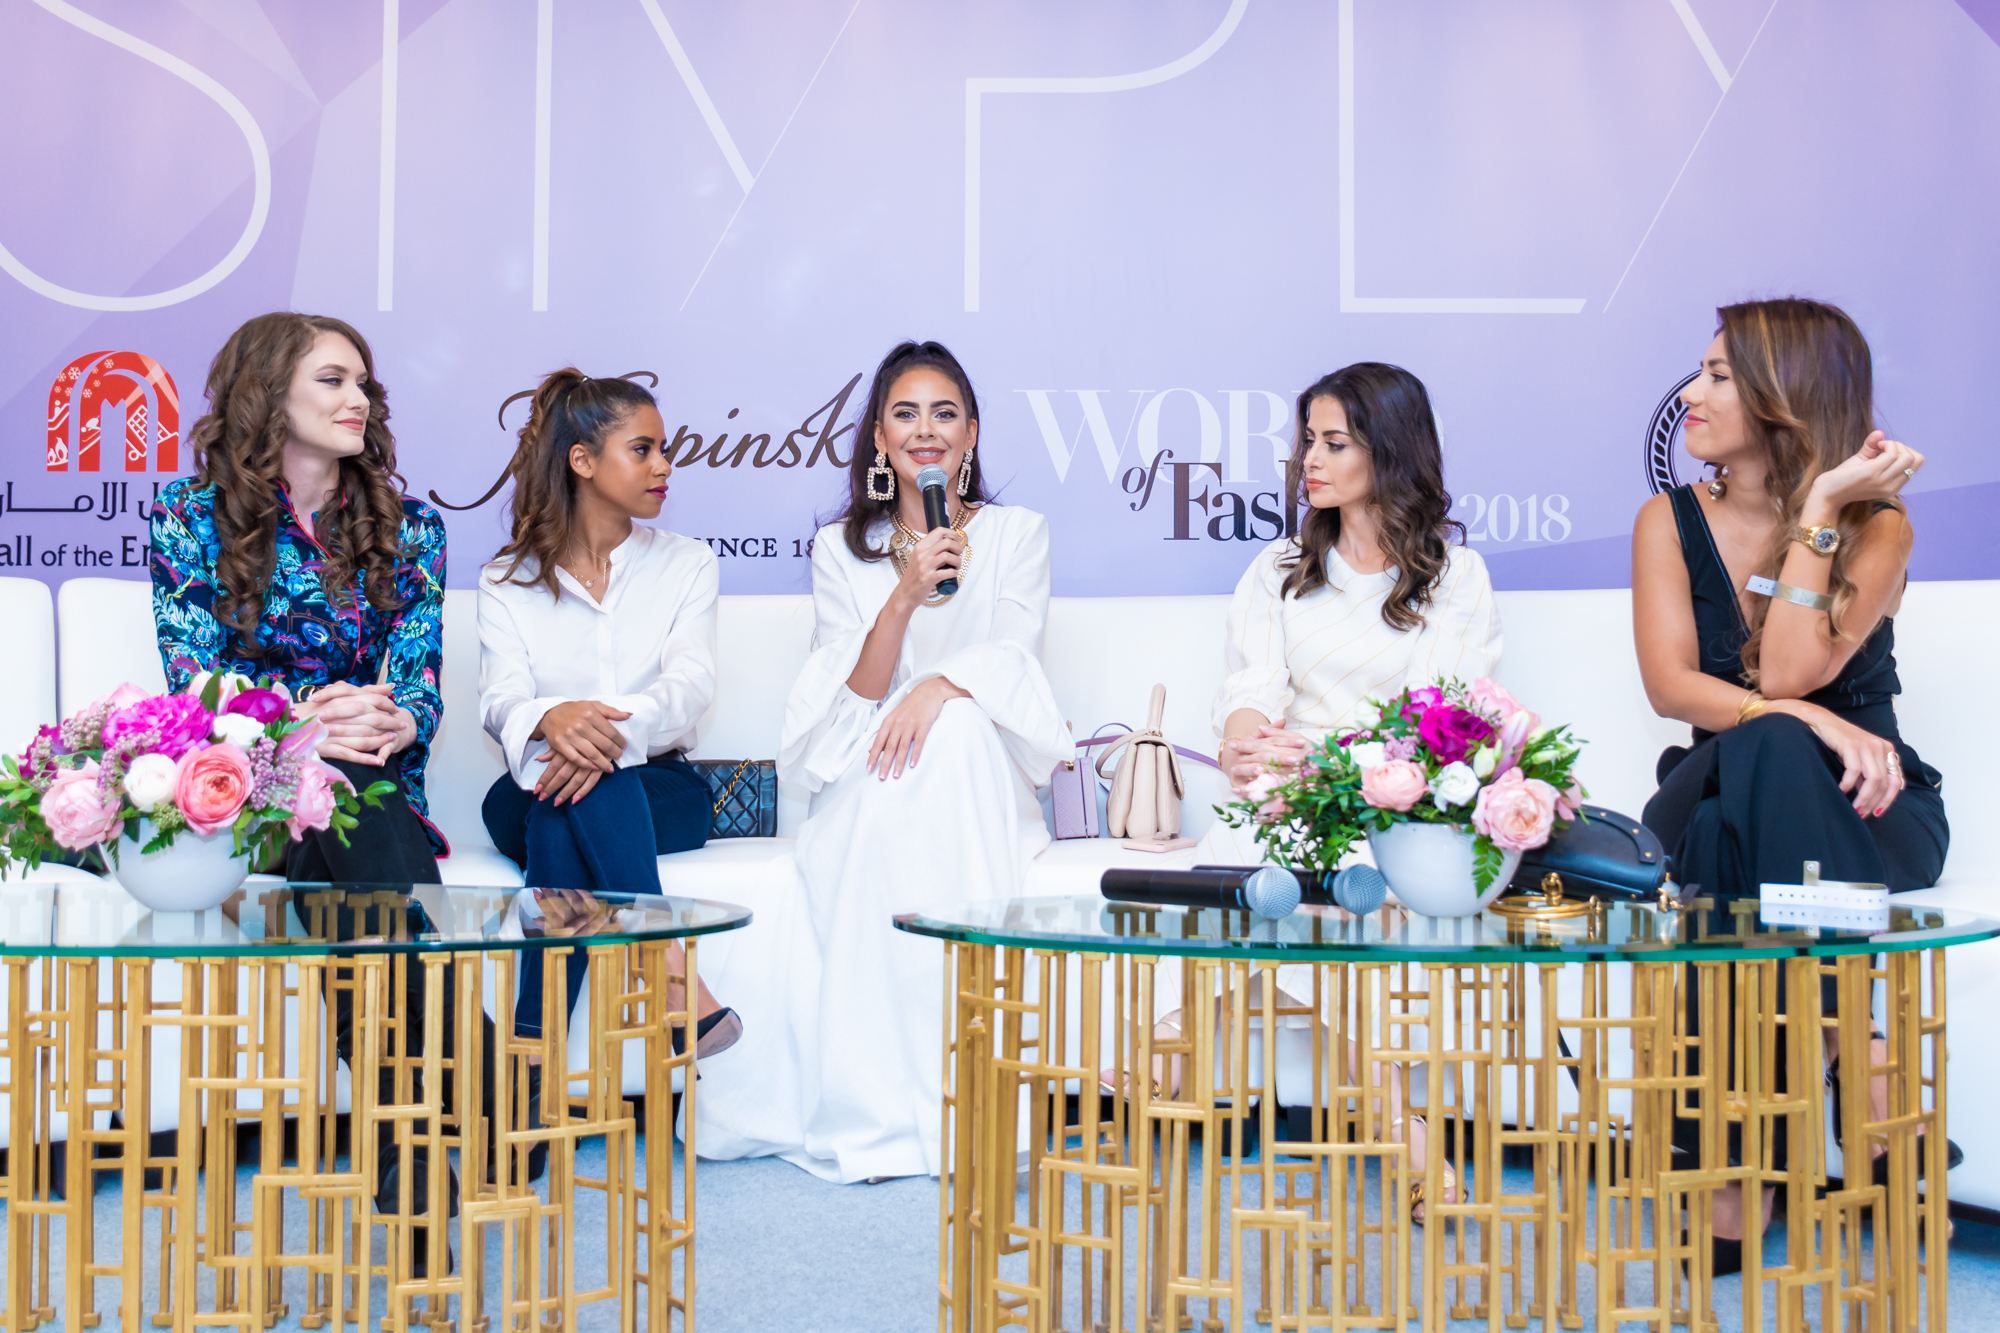 INFLUENCER PANEL  featuring Kelsey Johnson, Nadya Hasan, Tamara Al Gabbani, Nina Ali and Sai Ferrera